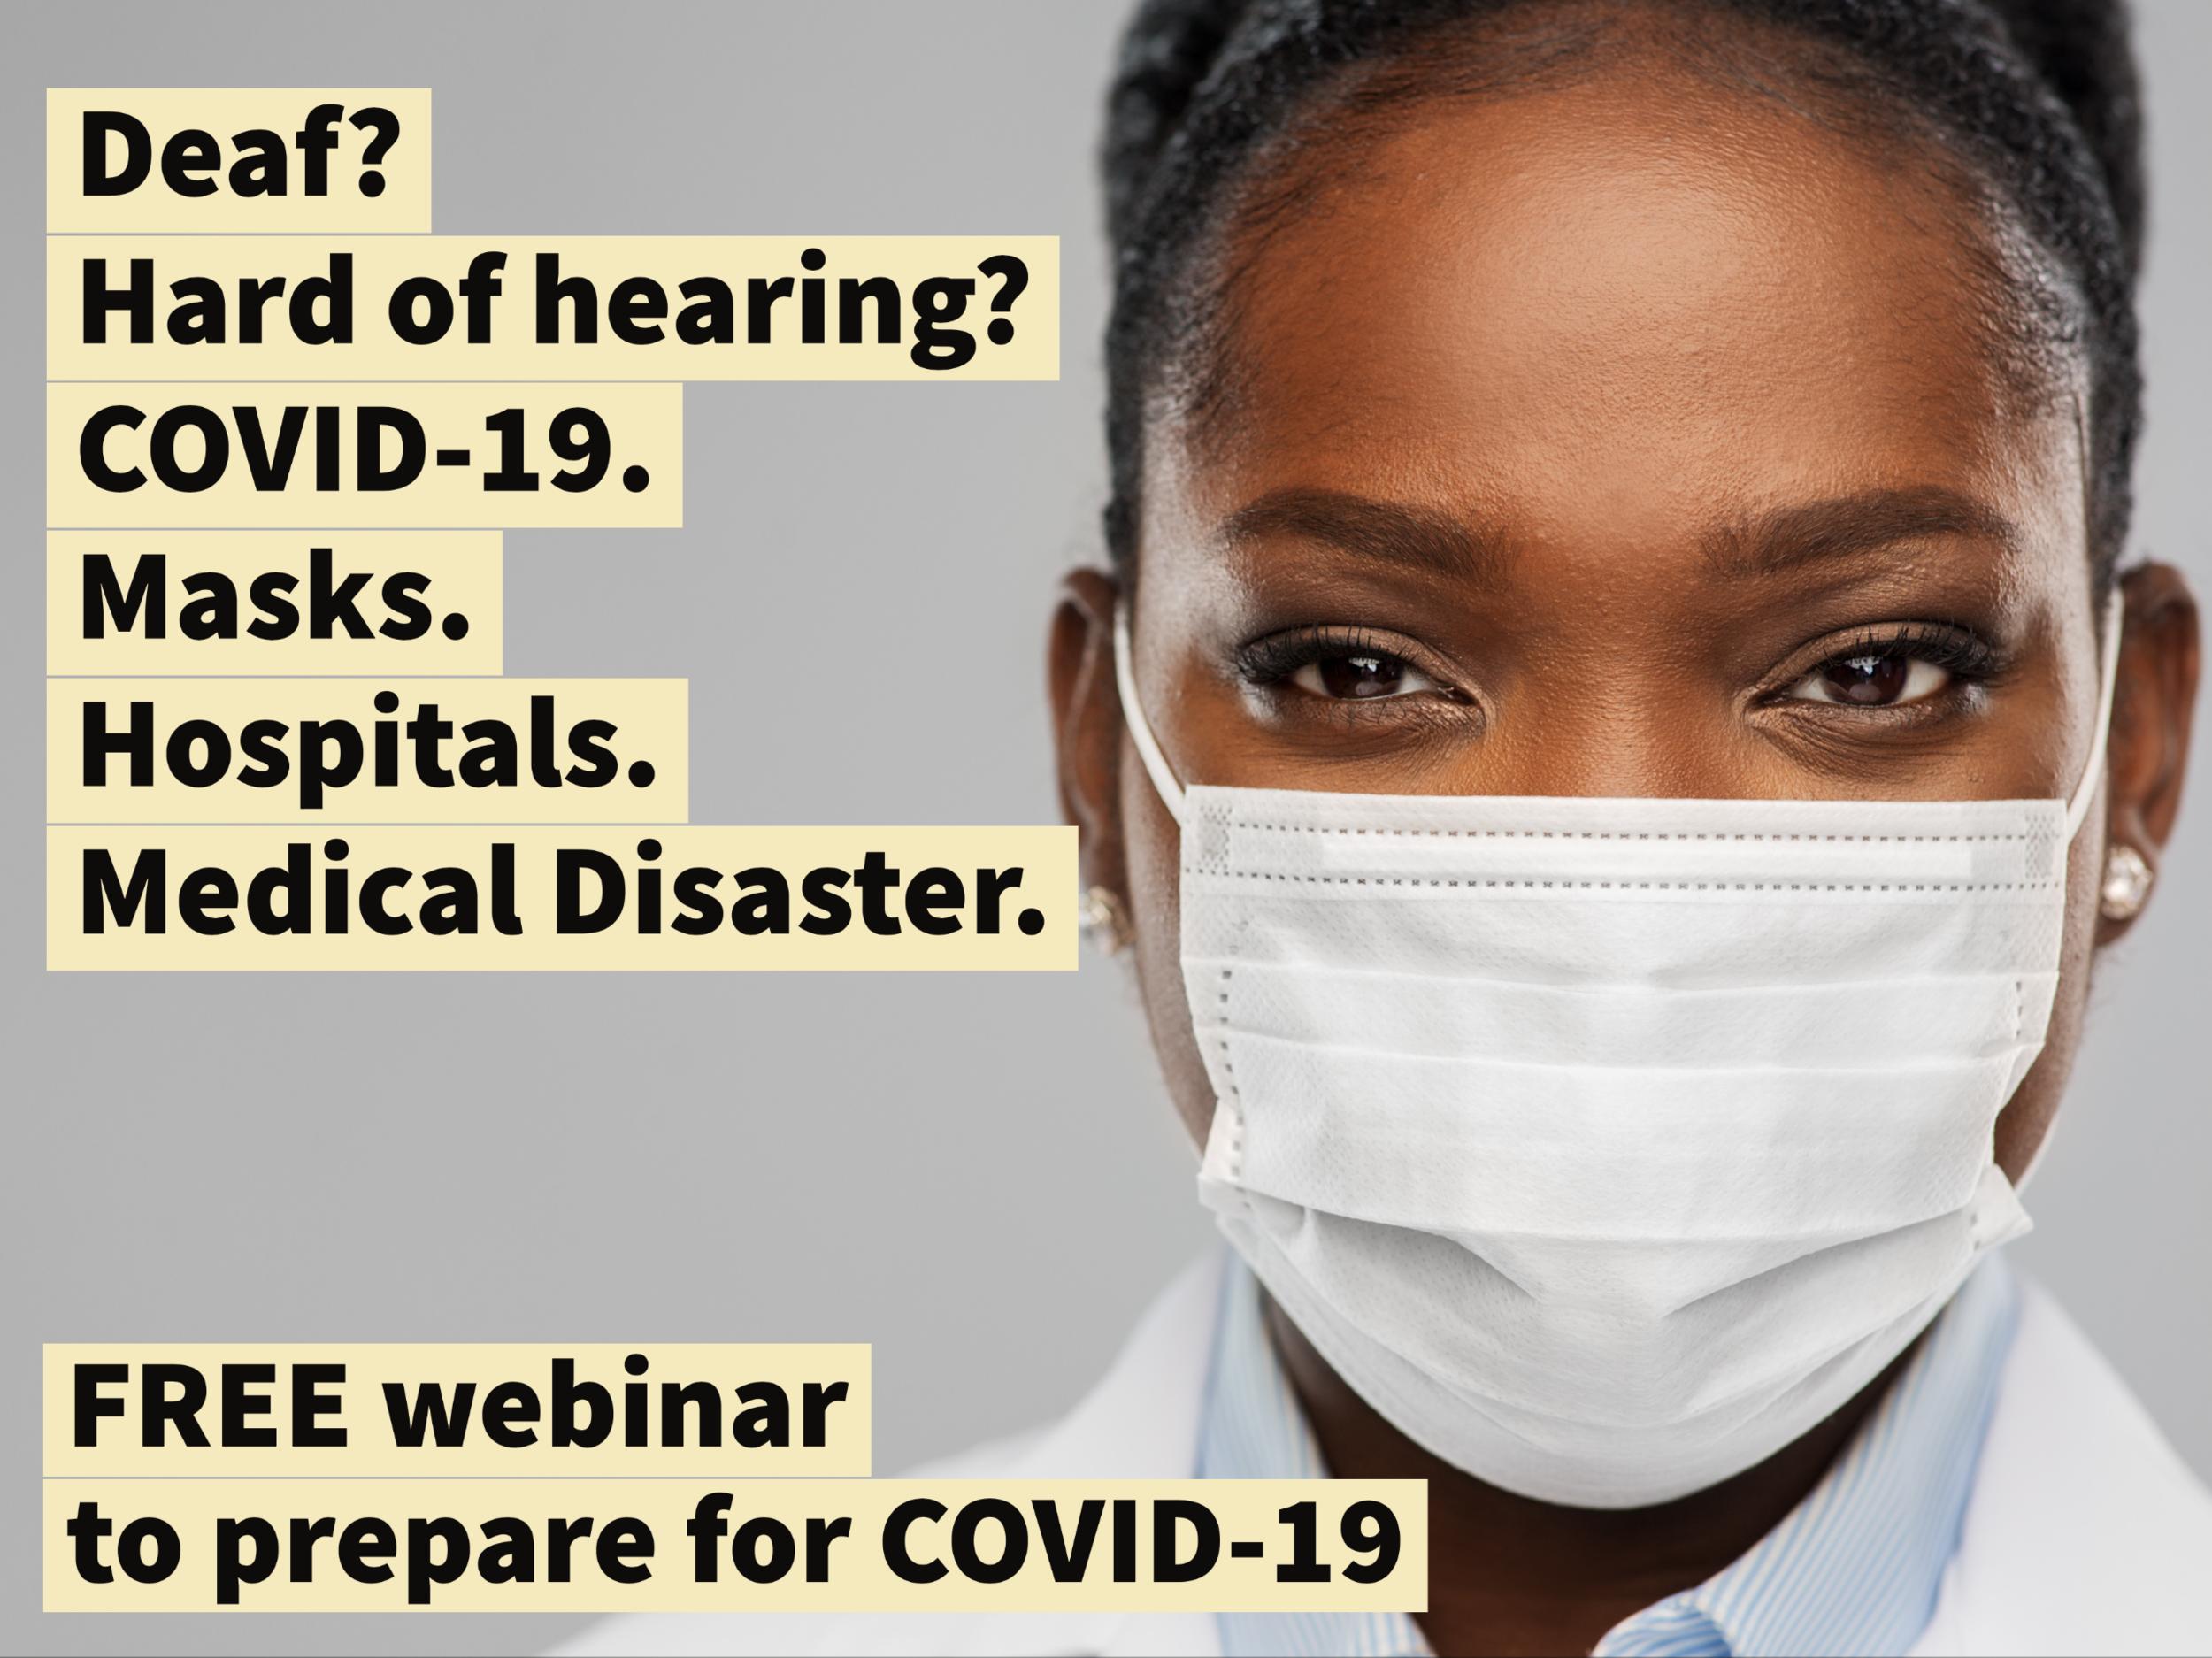 Covid-19, Hearing Loss  Hospitalization  Chad Ruffin, Md-7033